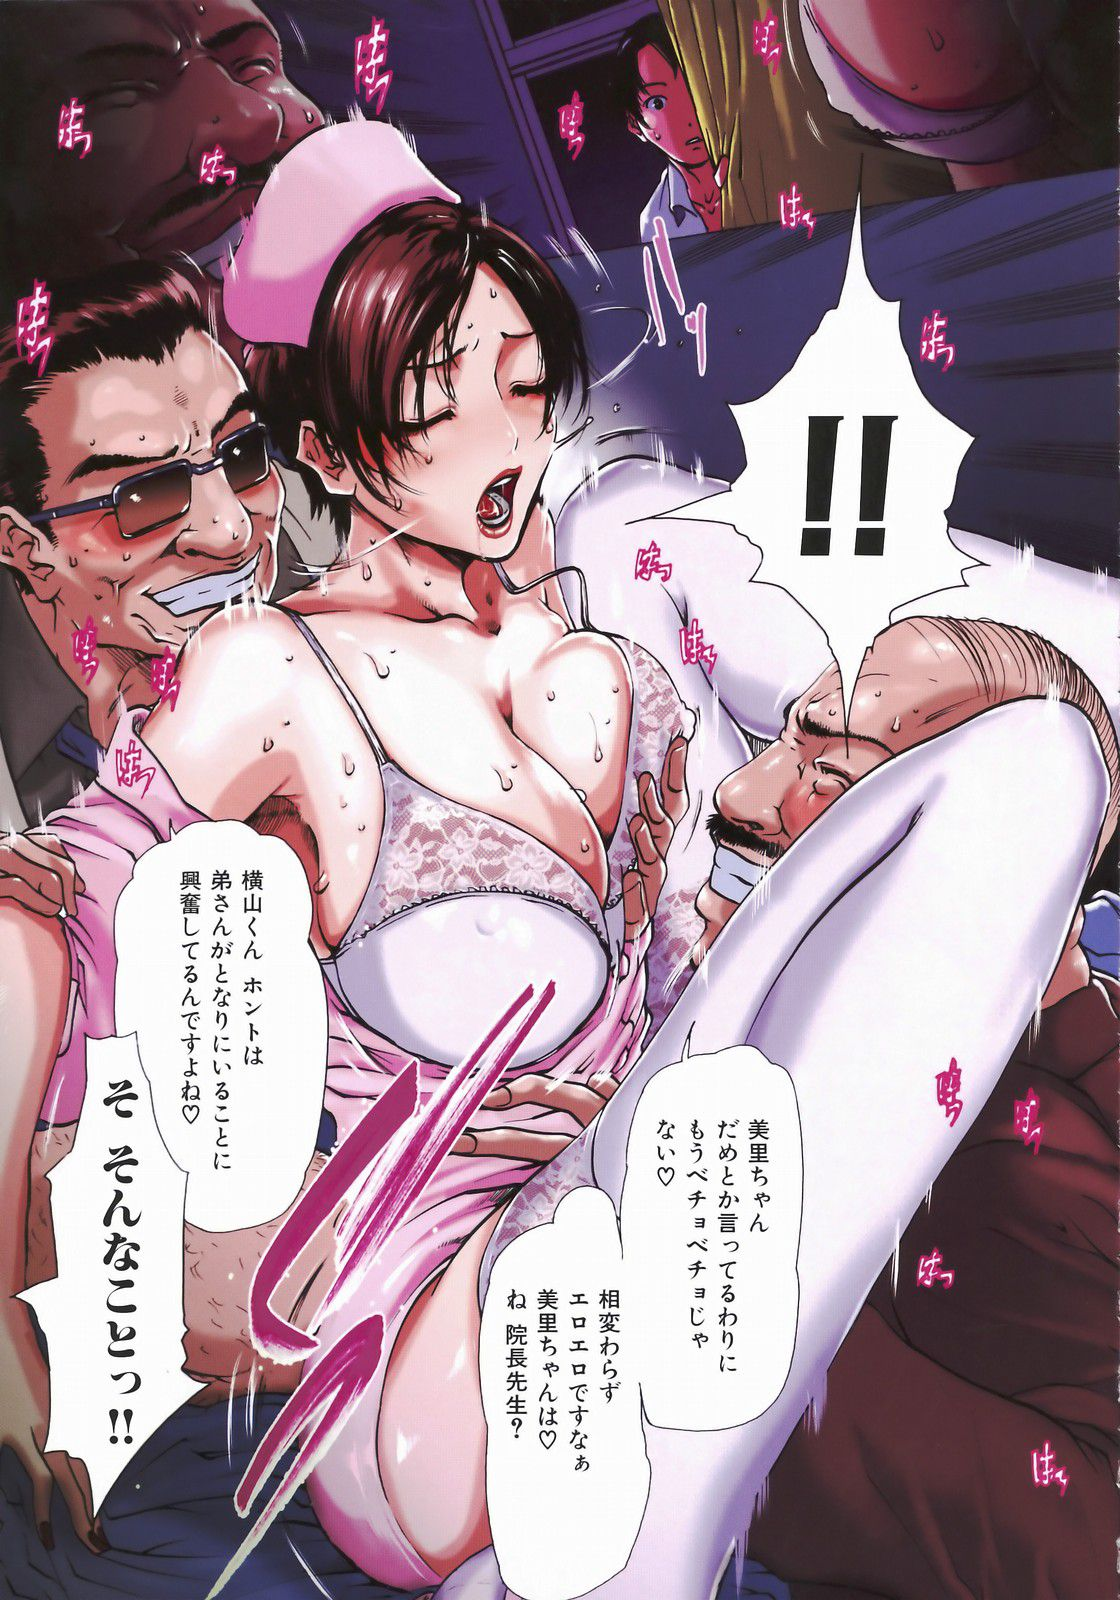 [ LINDA Project ] - Сборник хентай Манги / Hentai Manga Pack [Cen] [ENG,JAP] [Работ - 60шт / 4347 стр] [JPG,PNG] Hentai Manga